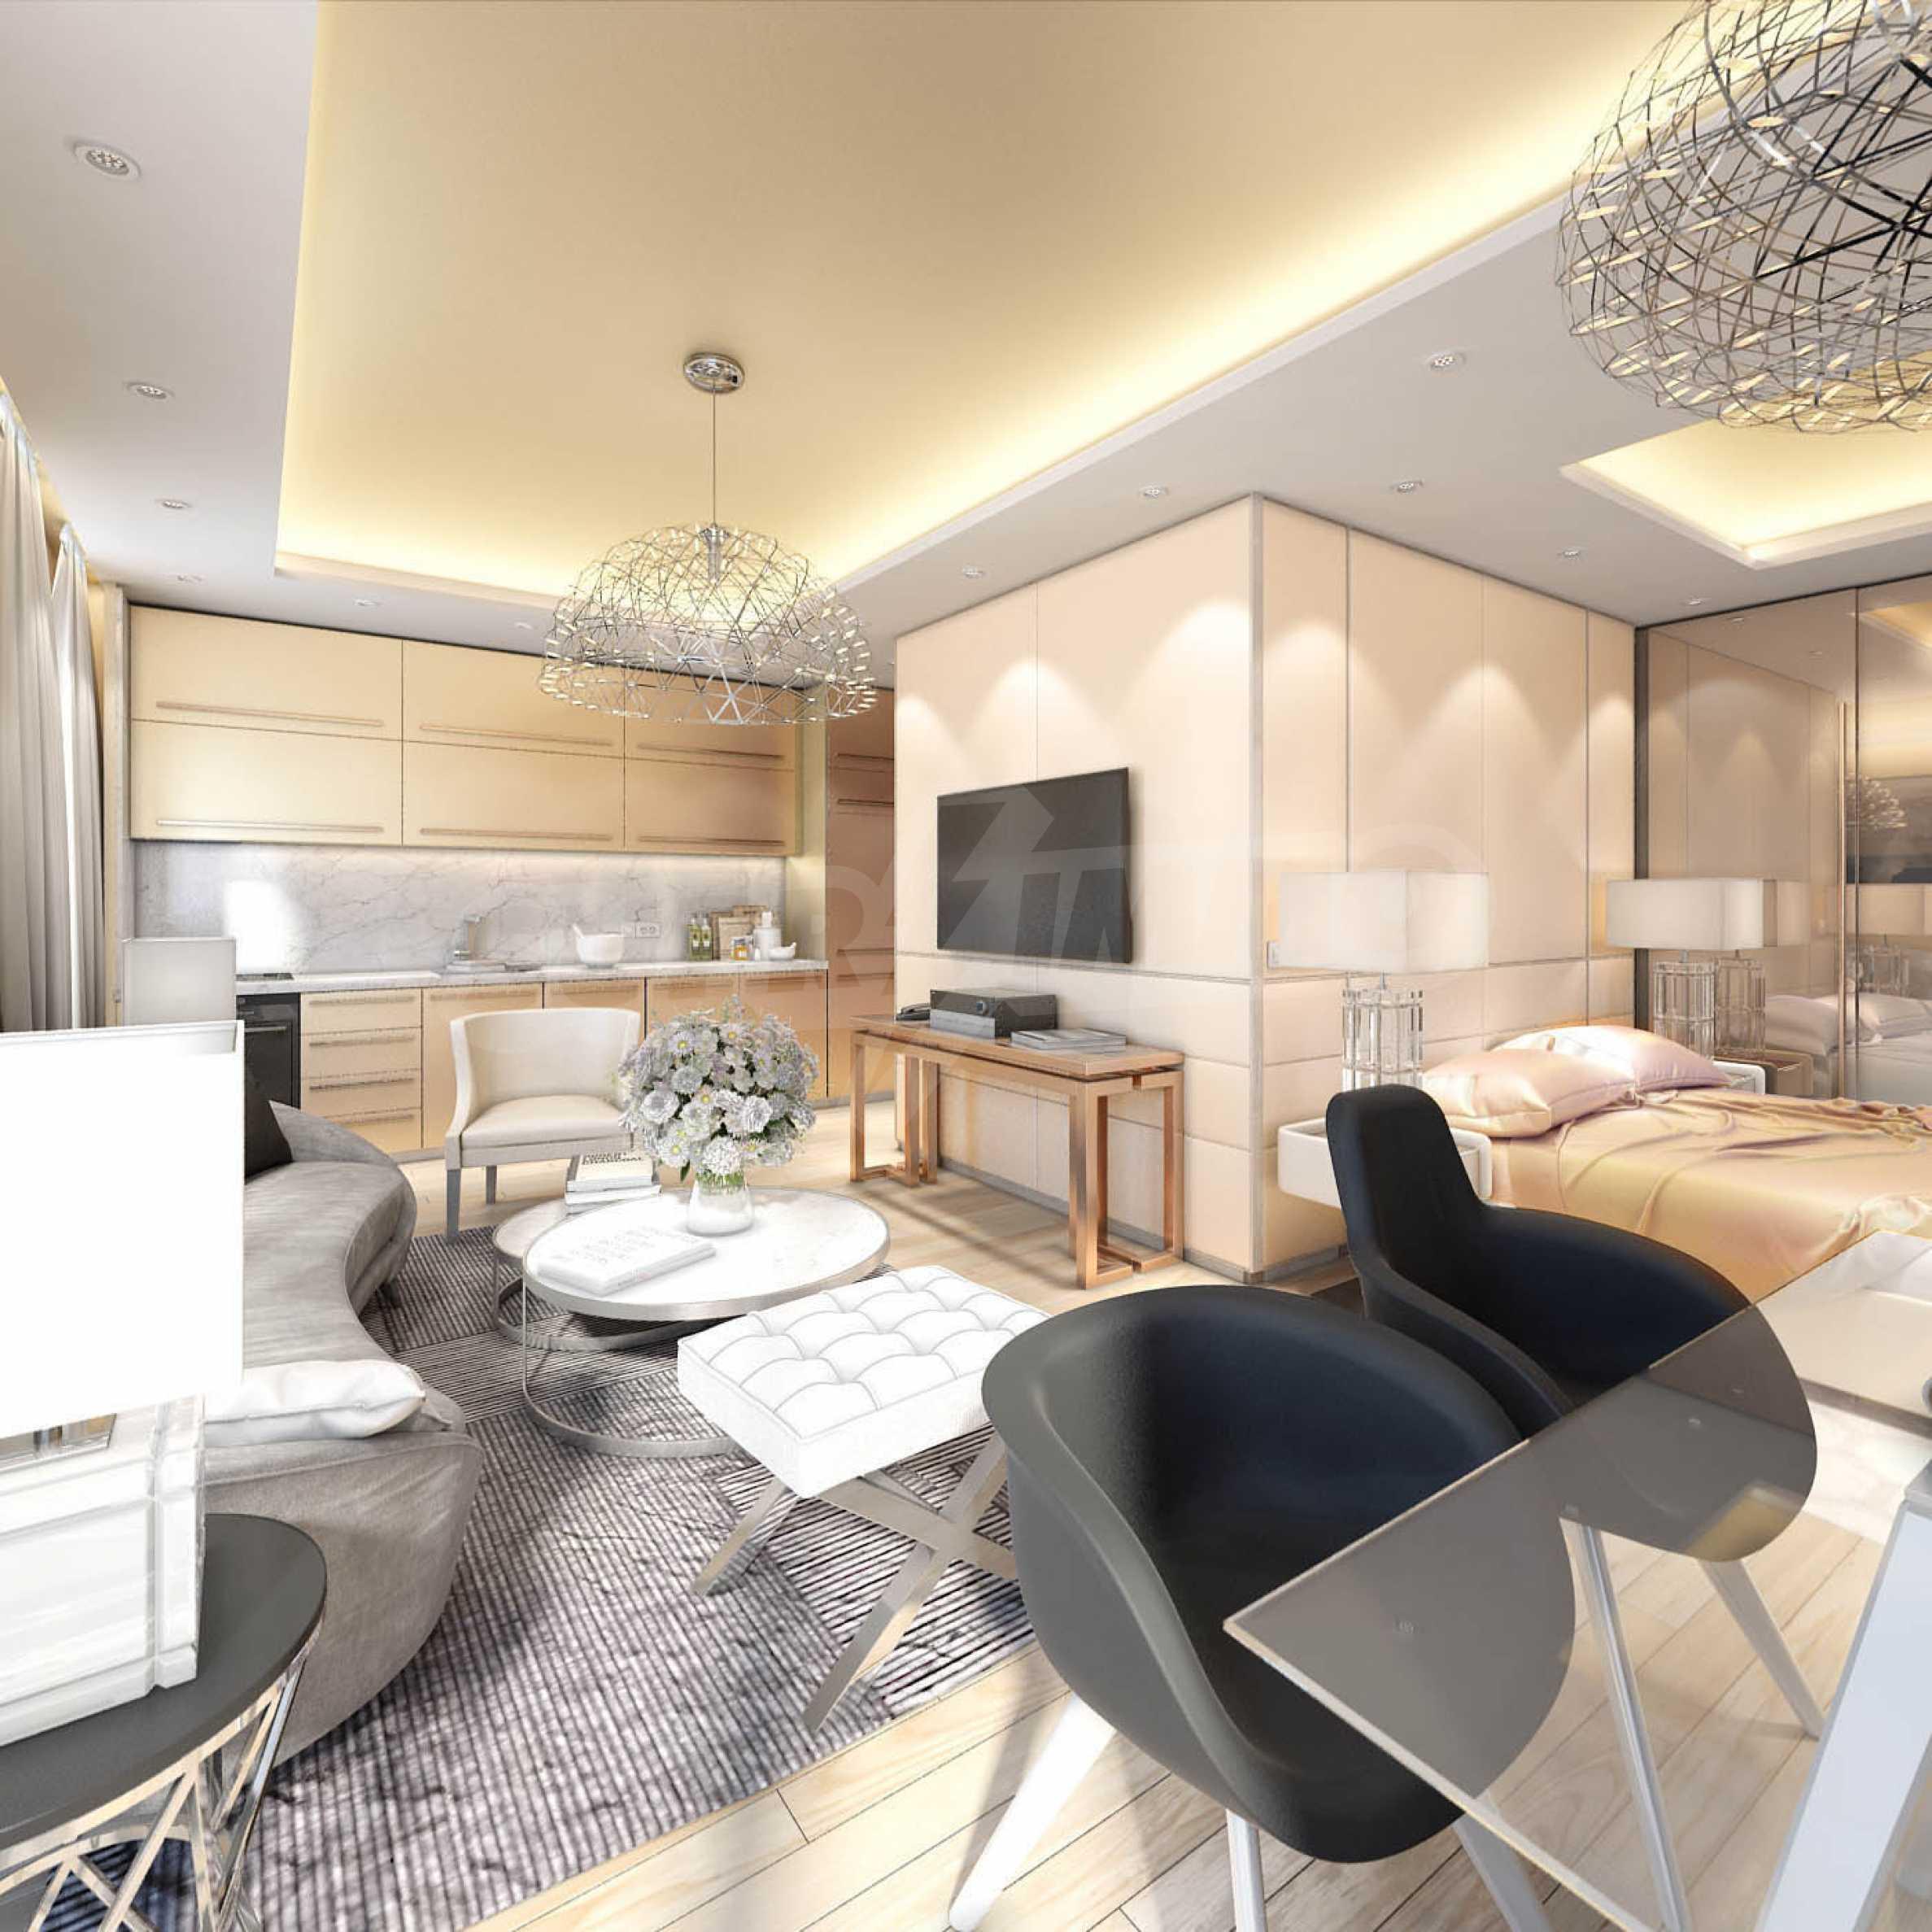 Нова сграда с луксозни апартаменти в гр. Бургас 16